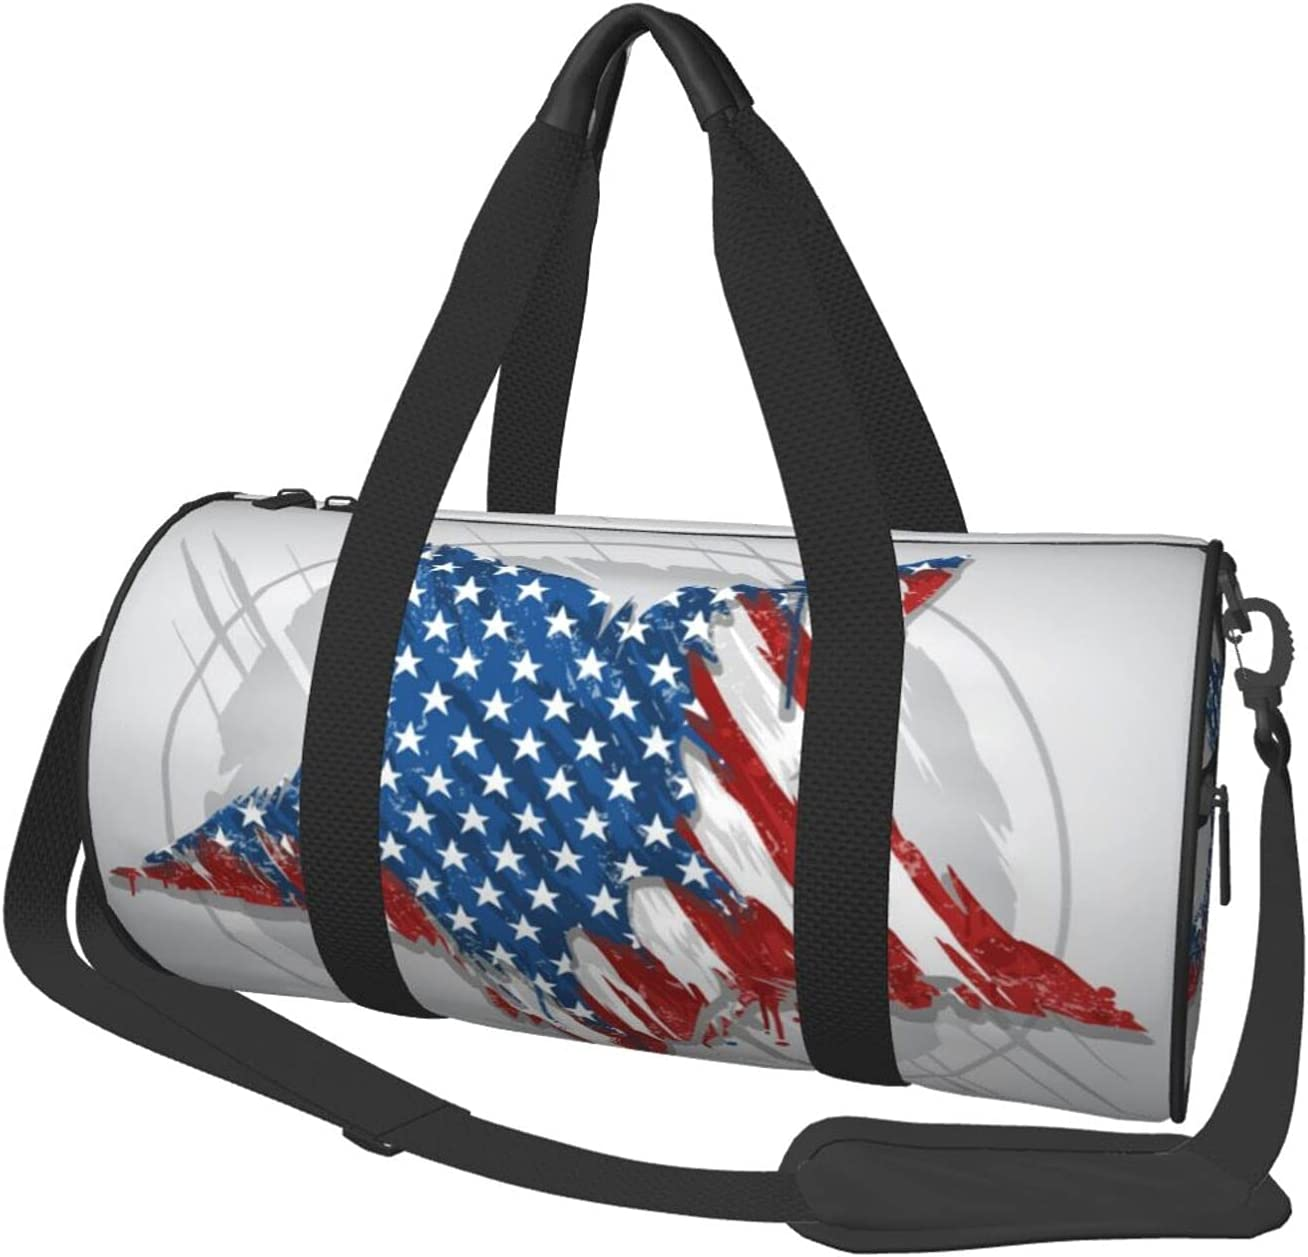 Kimisoy Gym Minneapolis Mall Selling rankings Duffel Bag Star Abstract Sports Flag America Usa